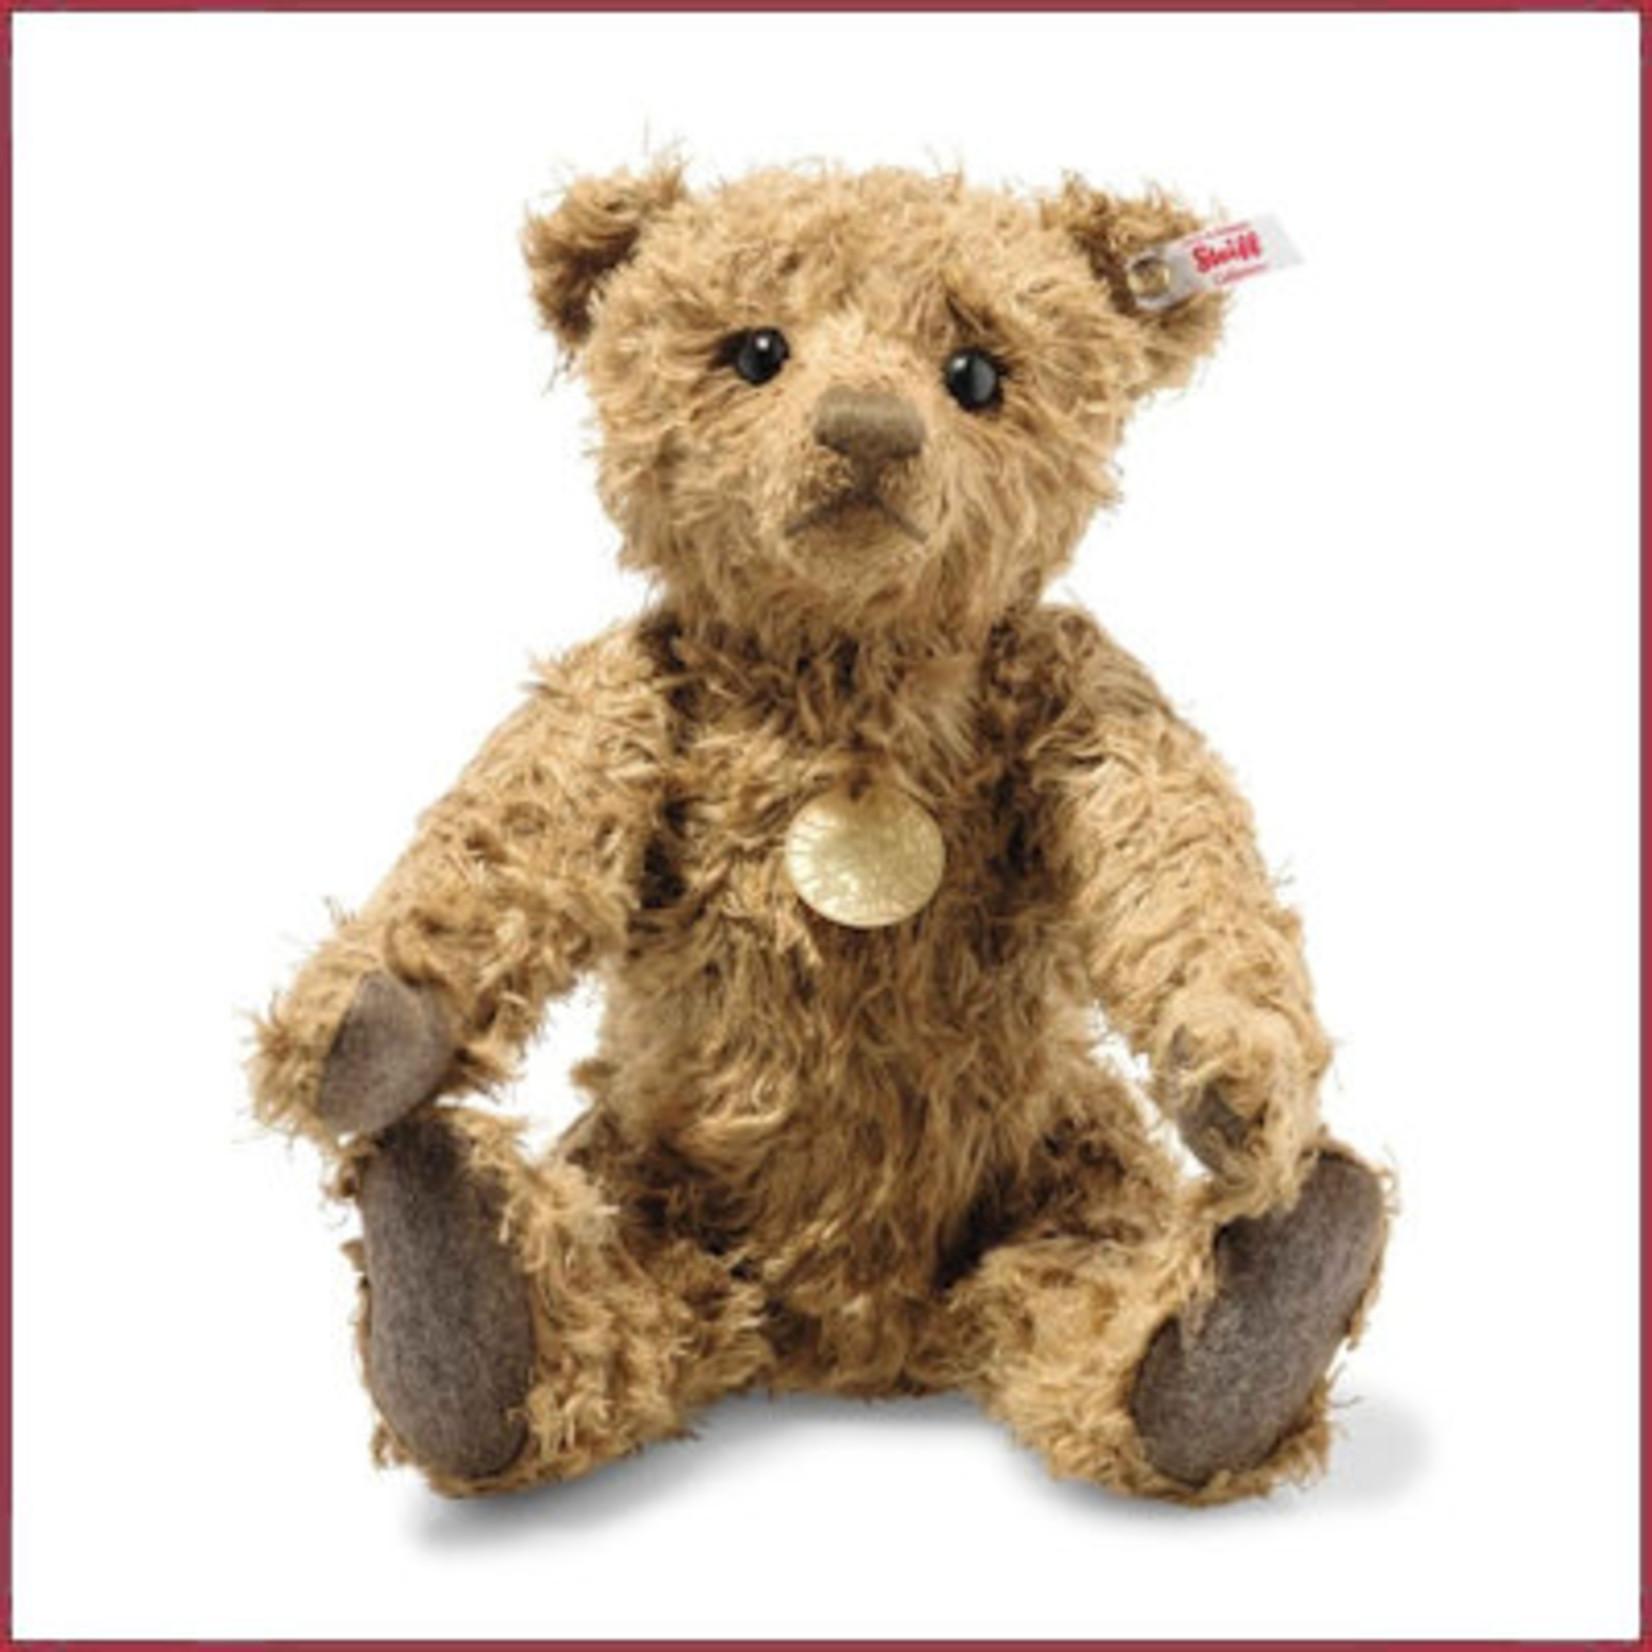 Steiff Teddybear Hansel 36 Hanf /Hennep Braun